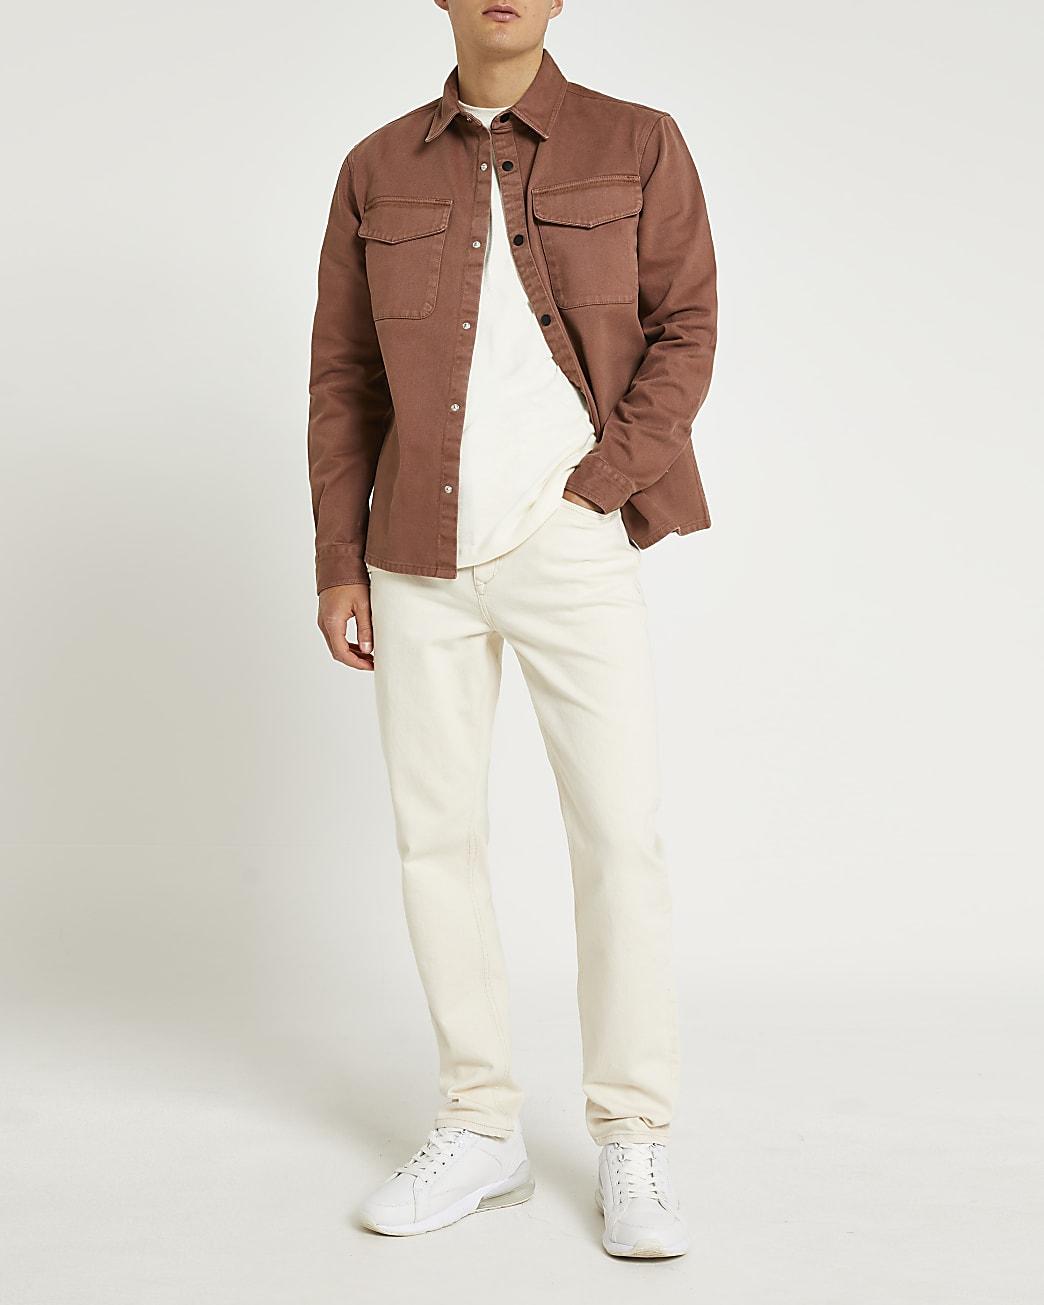 Brown regular fit long sleeve shacket